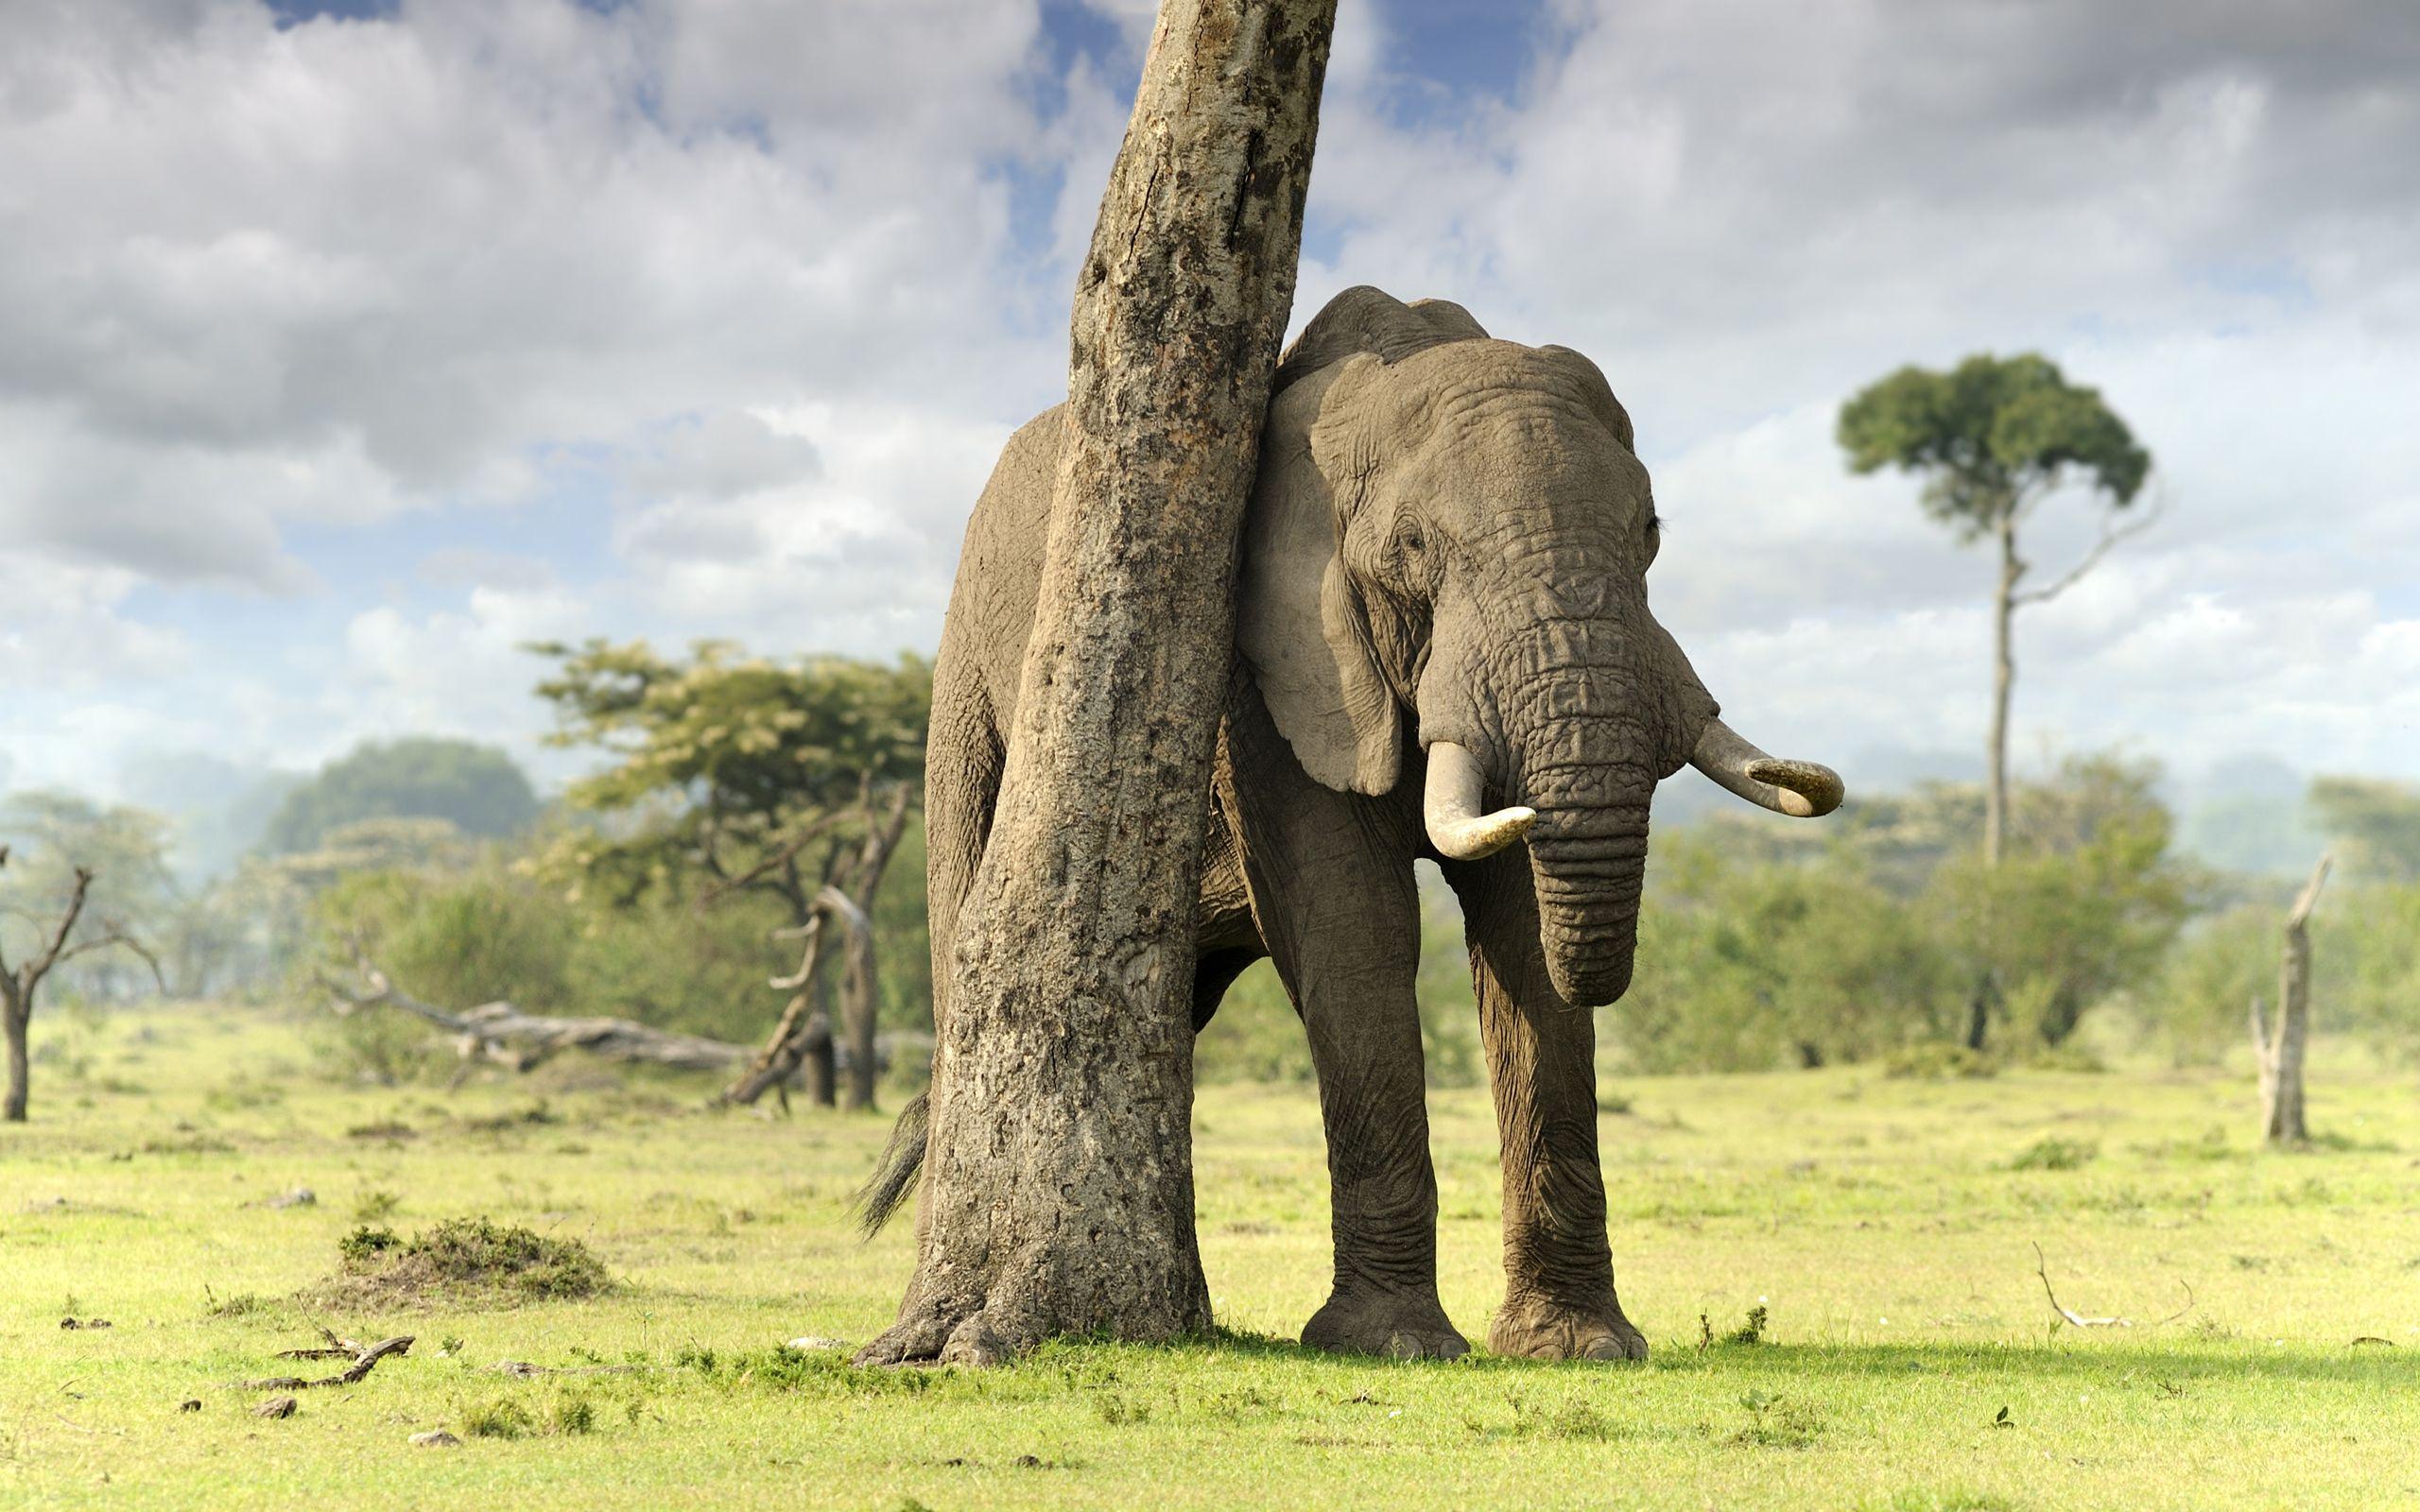 free images of elephants